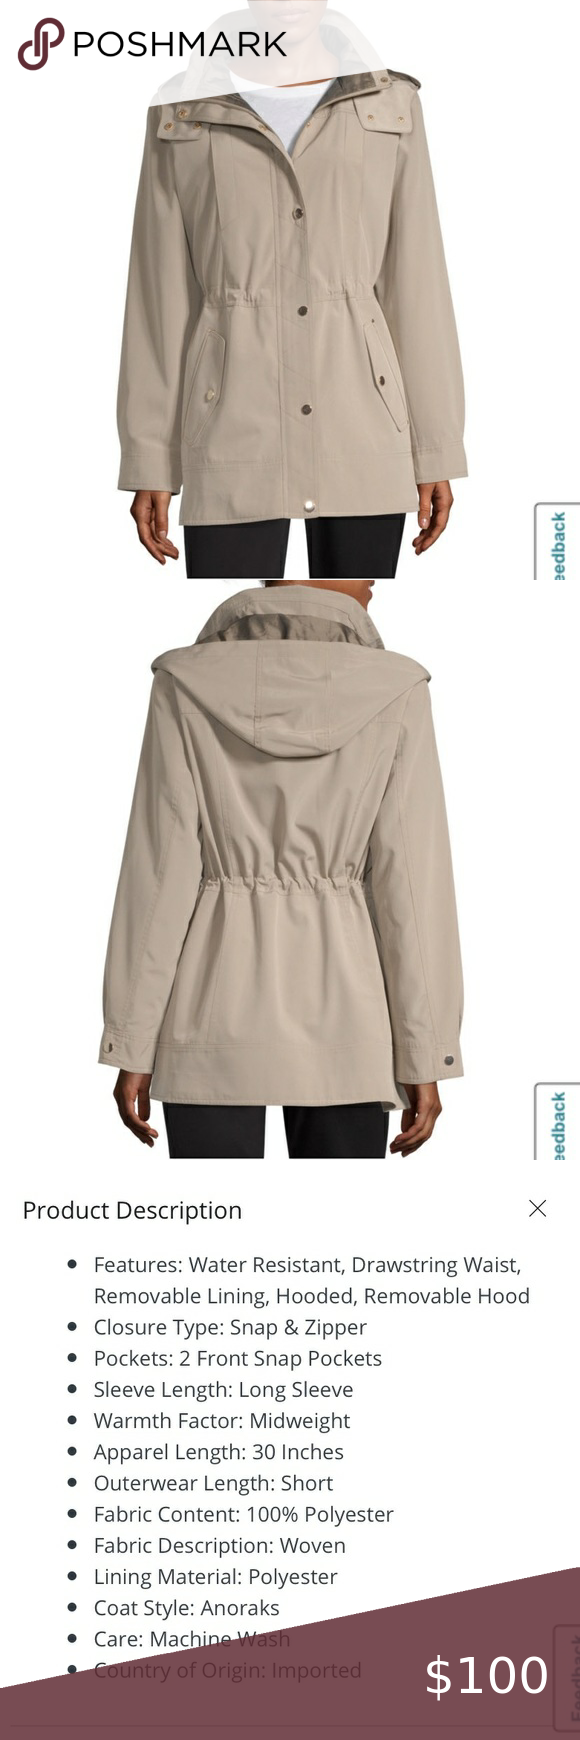 Liz Claiborne Hooded Water Resistant Anorak Jacket Anorak Jacket Anorak Liz Claiborne [ 1740 x 580 Pixel ]